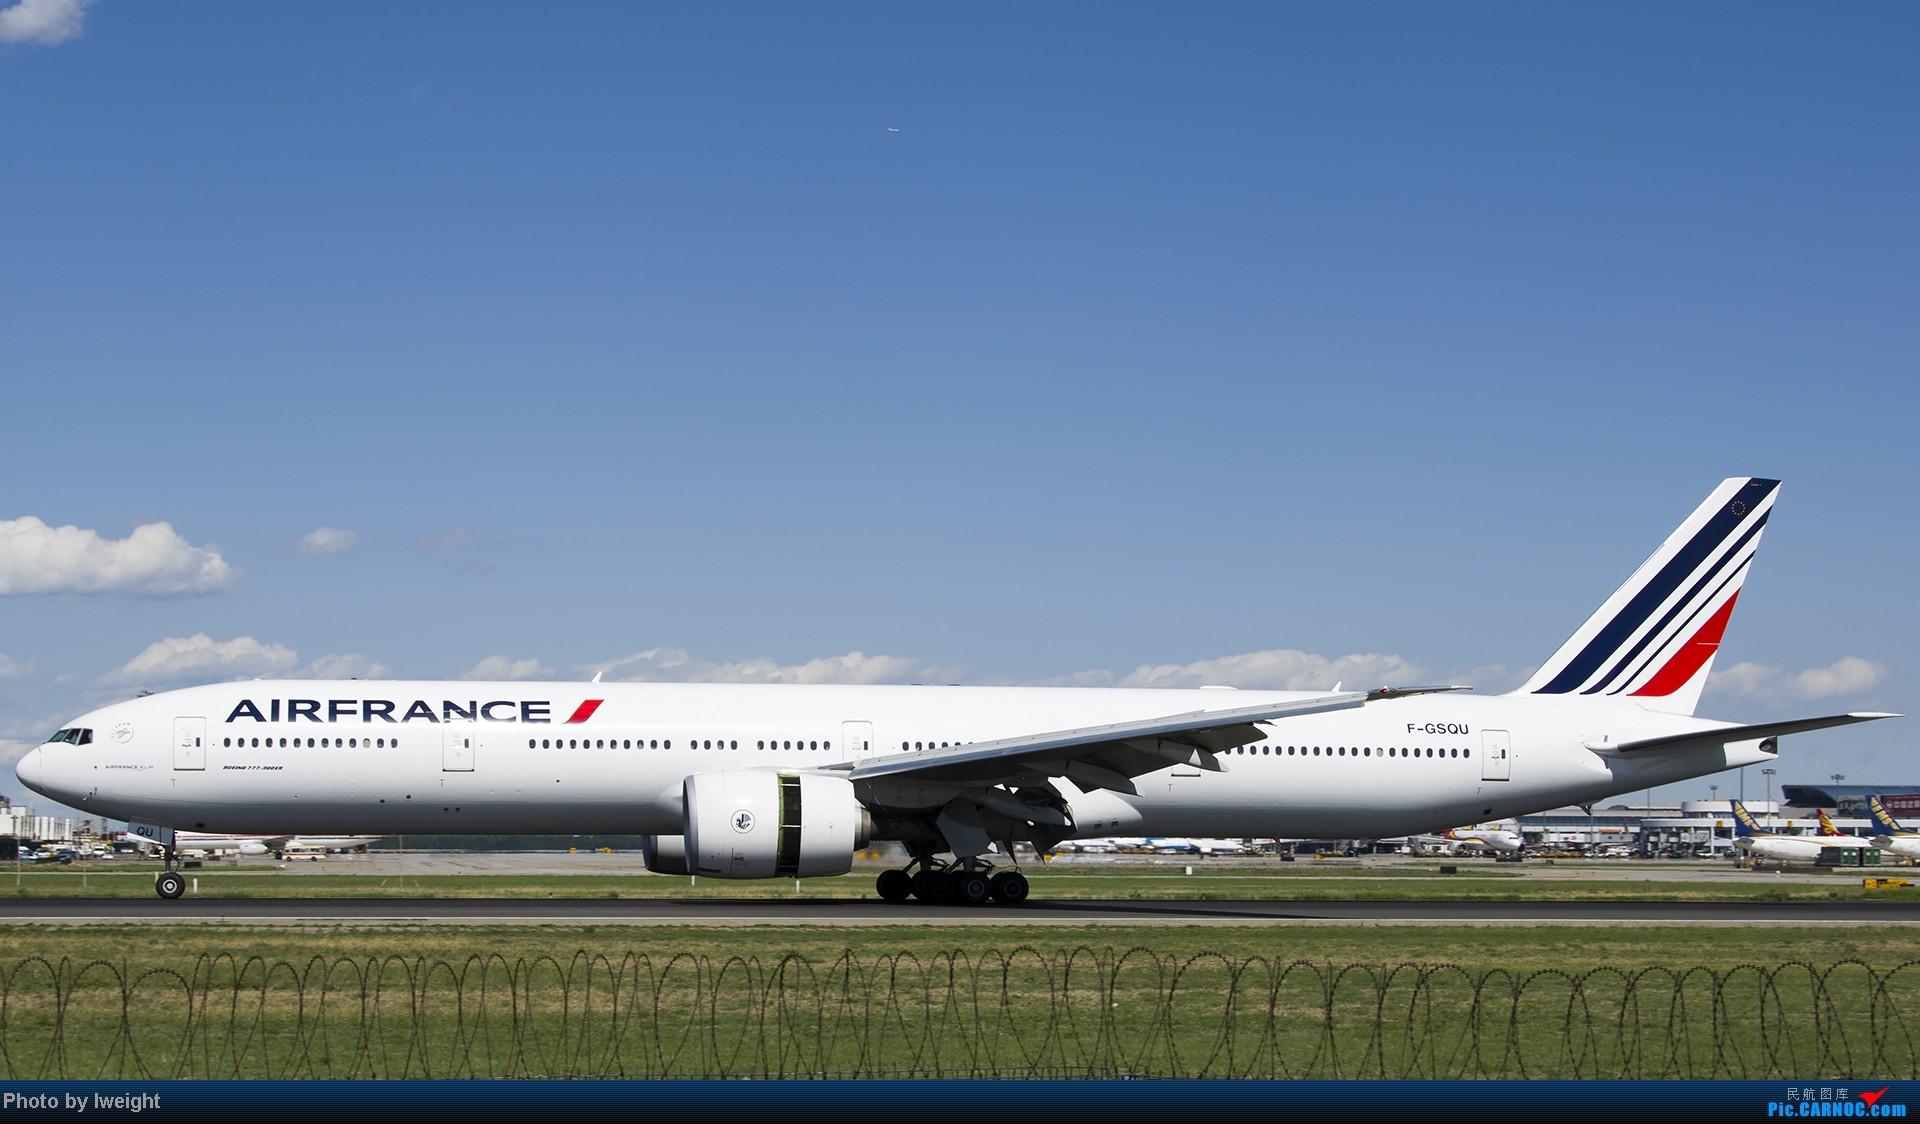 Re:[原创]新相机+好天气,PEK试机乱拍 BOEING 777-300ER F-GSQU 中国北京首都机场